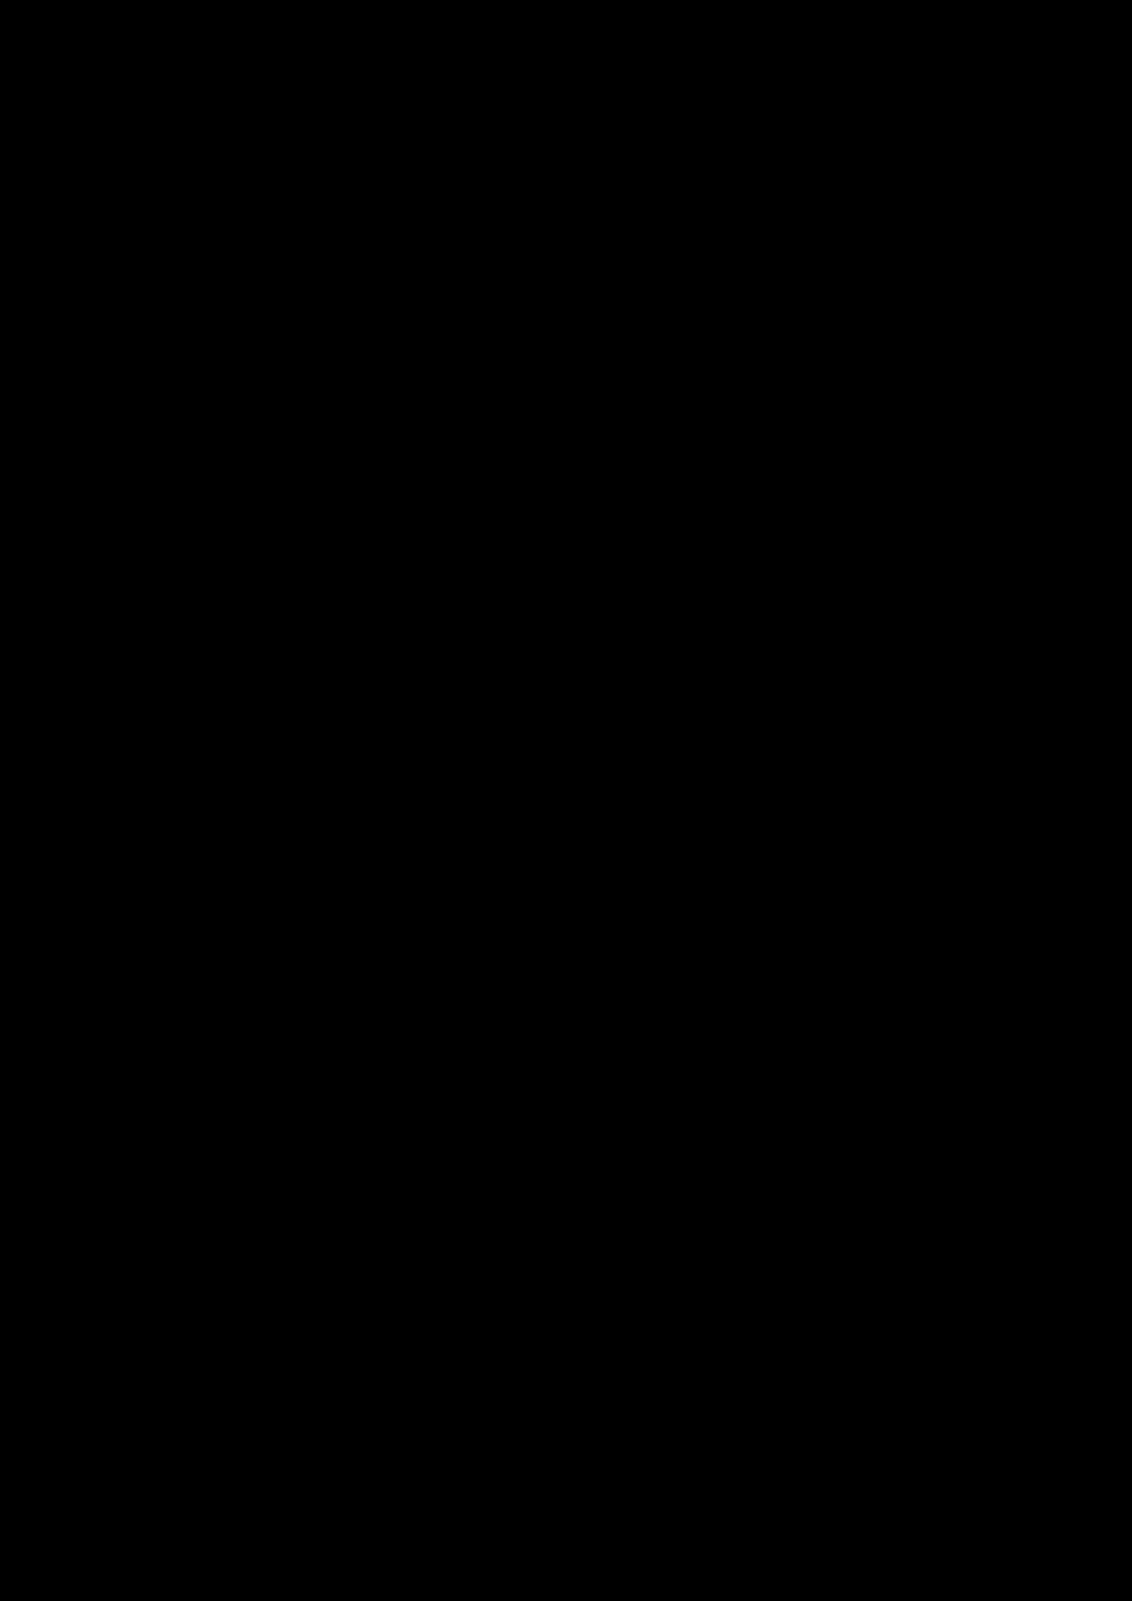 Belyiy sokol slide, Image 117